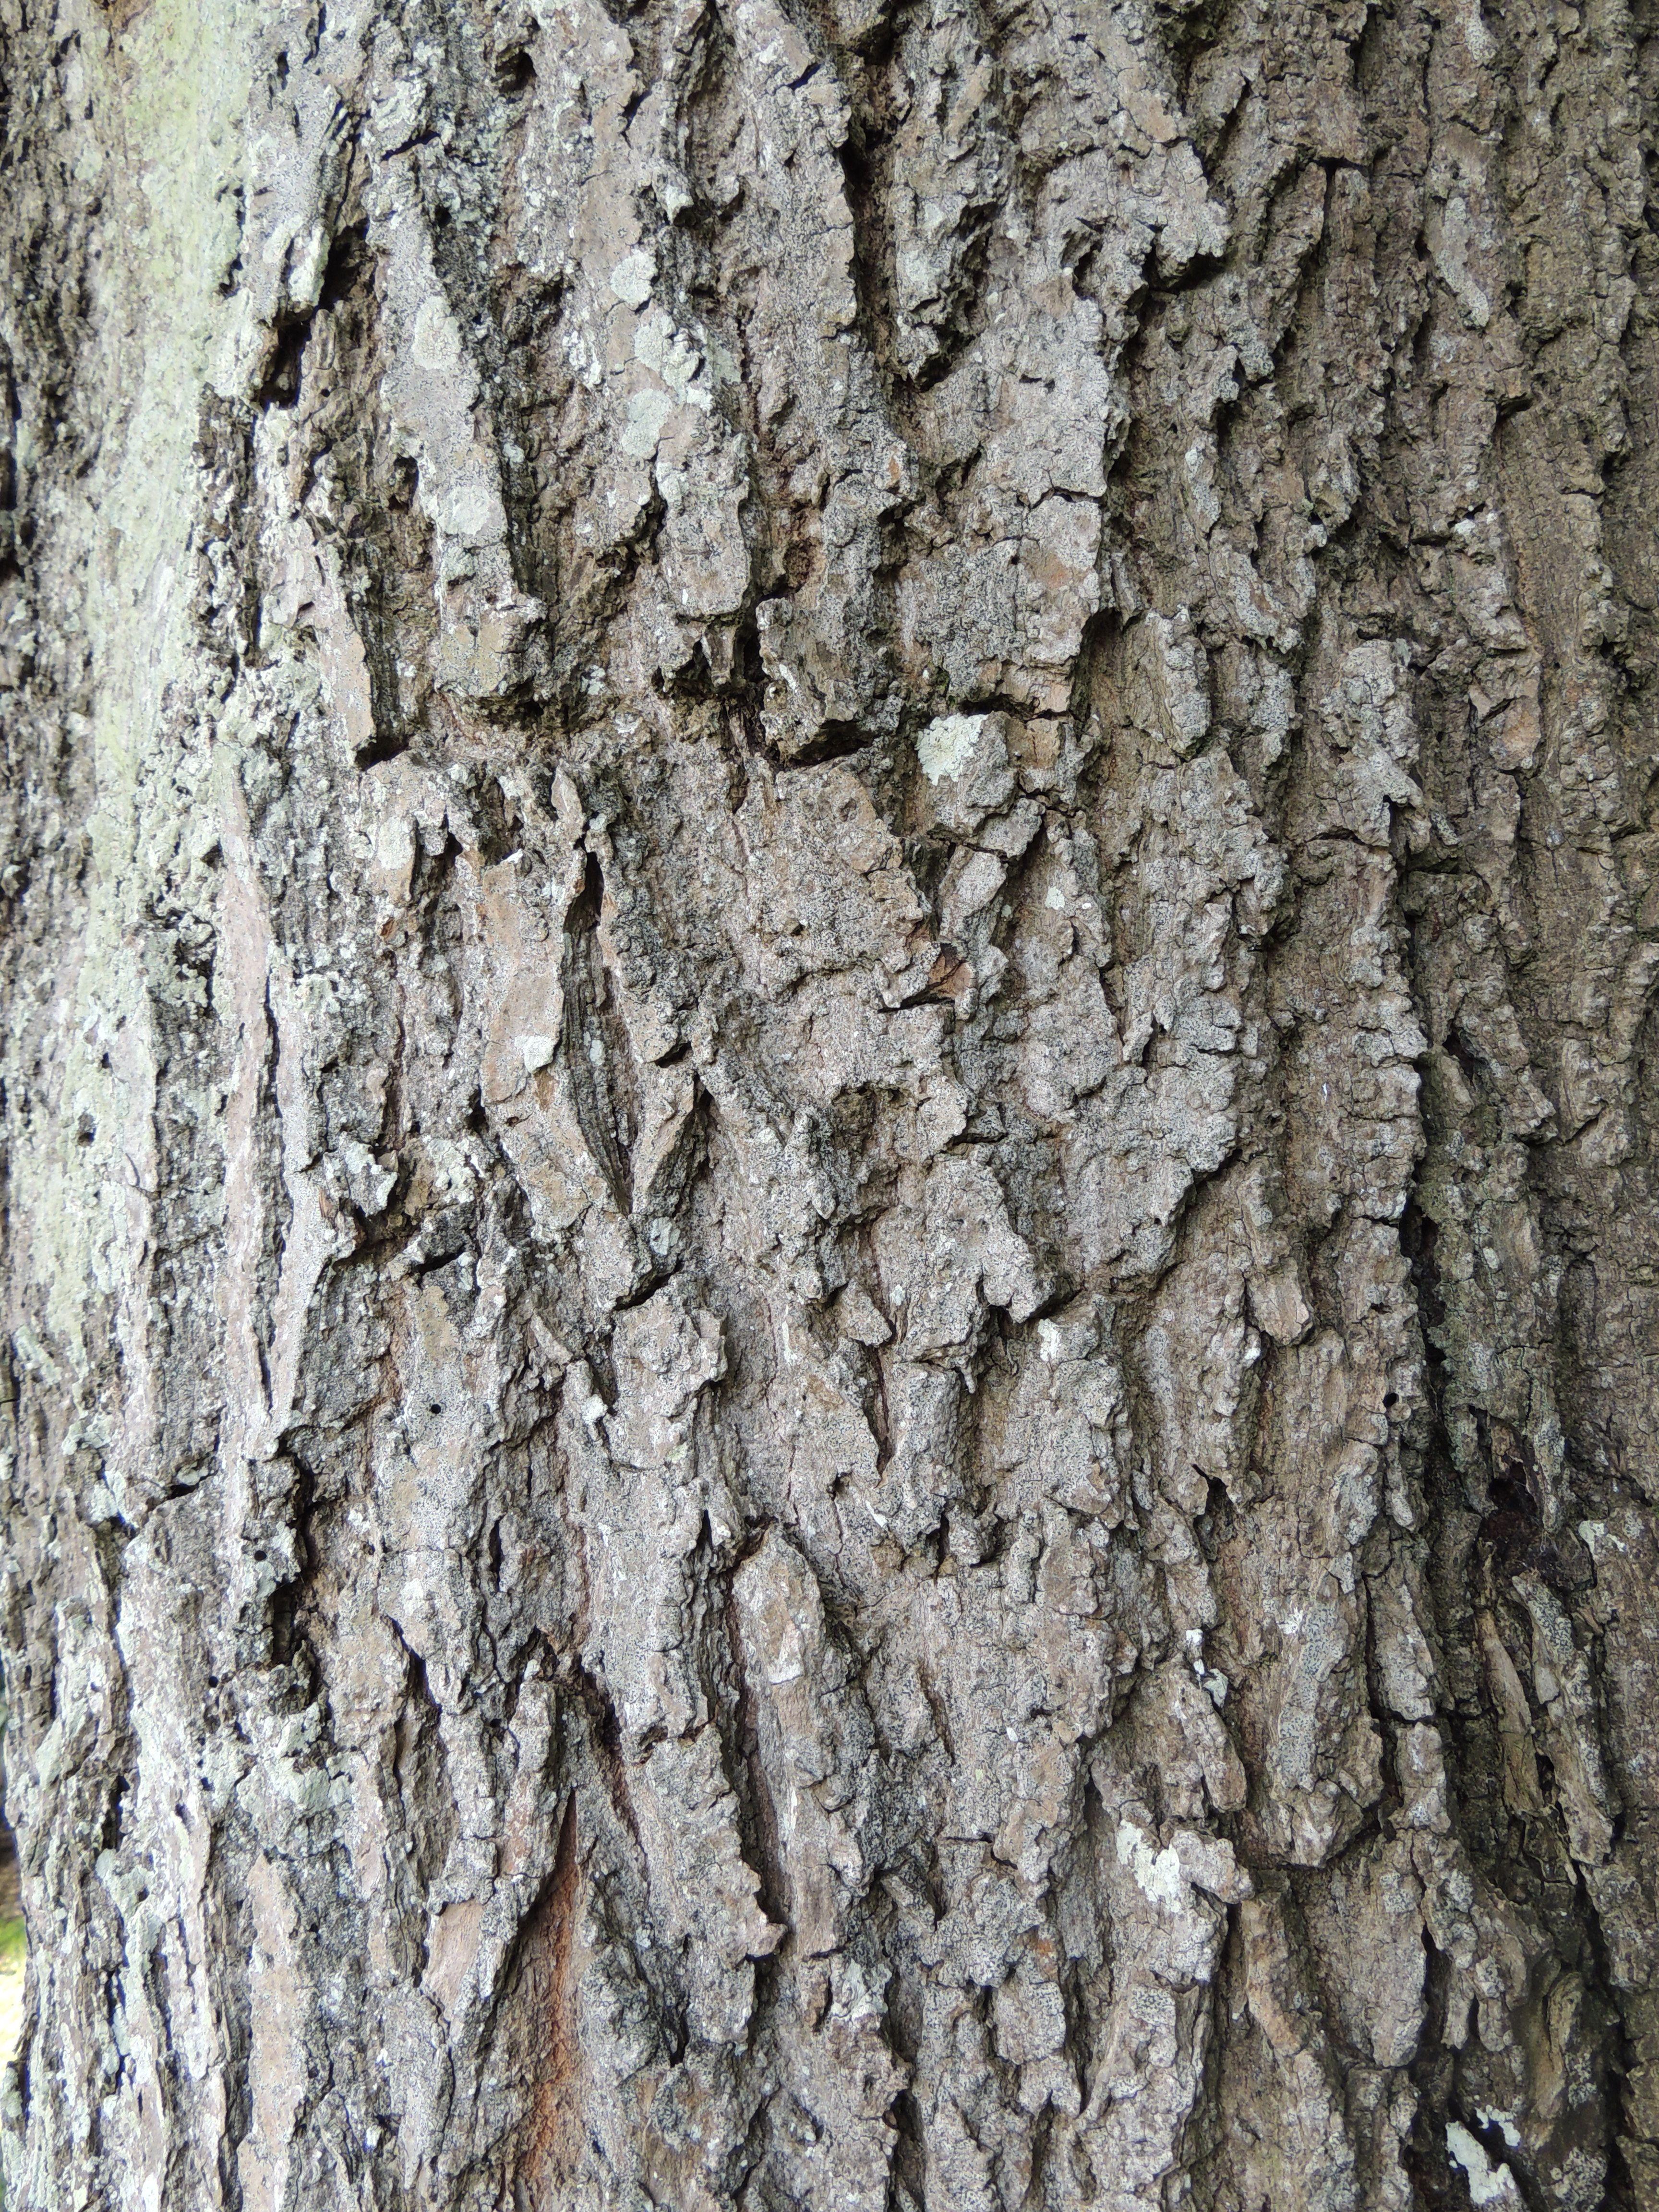 Common ash (Fraxinus excelsior) bark, not quite so rough